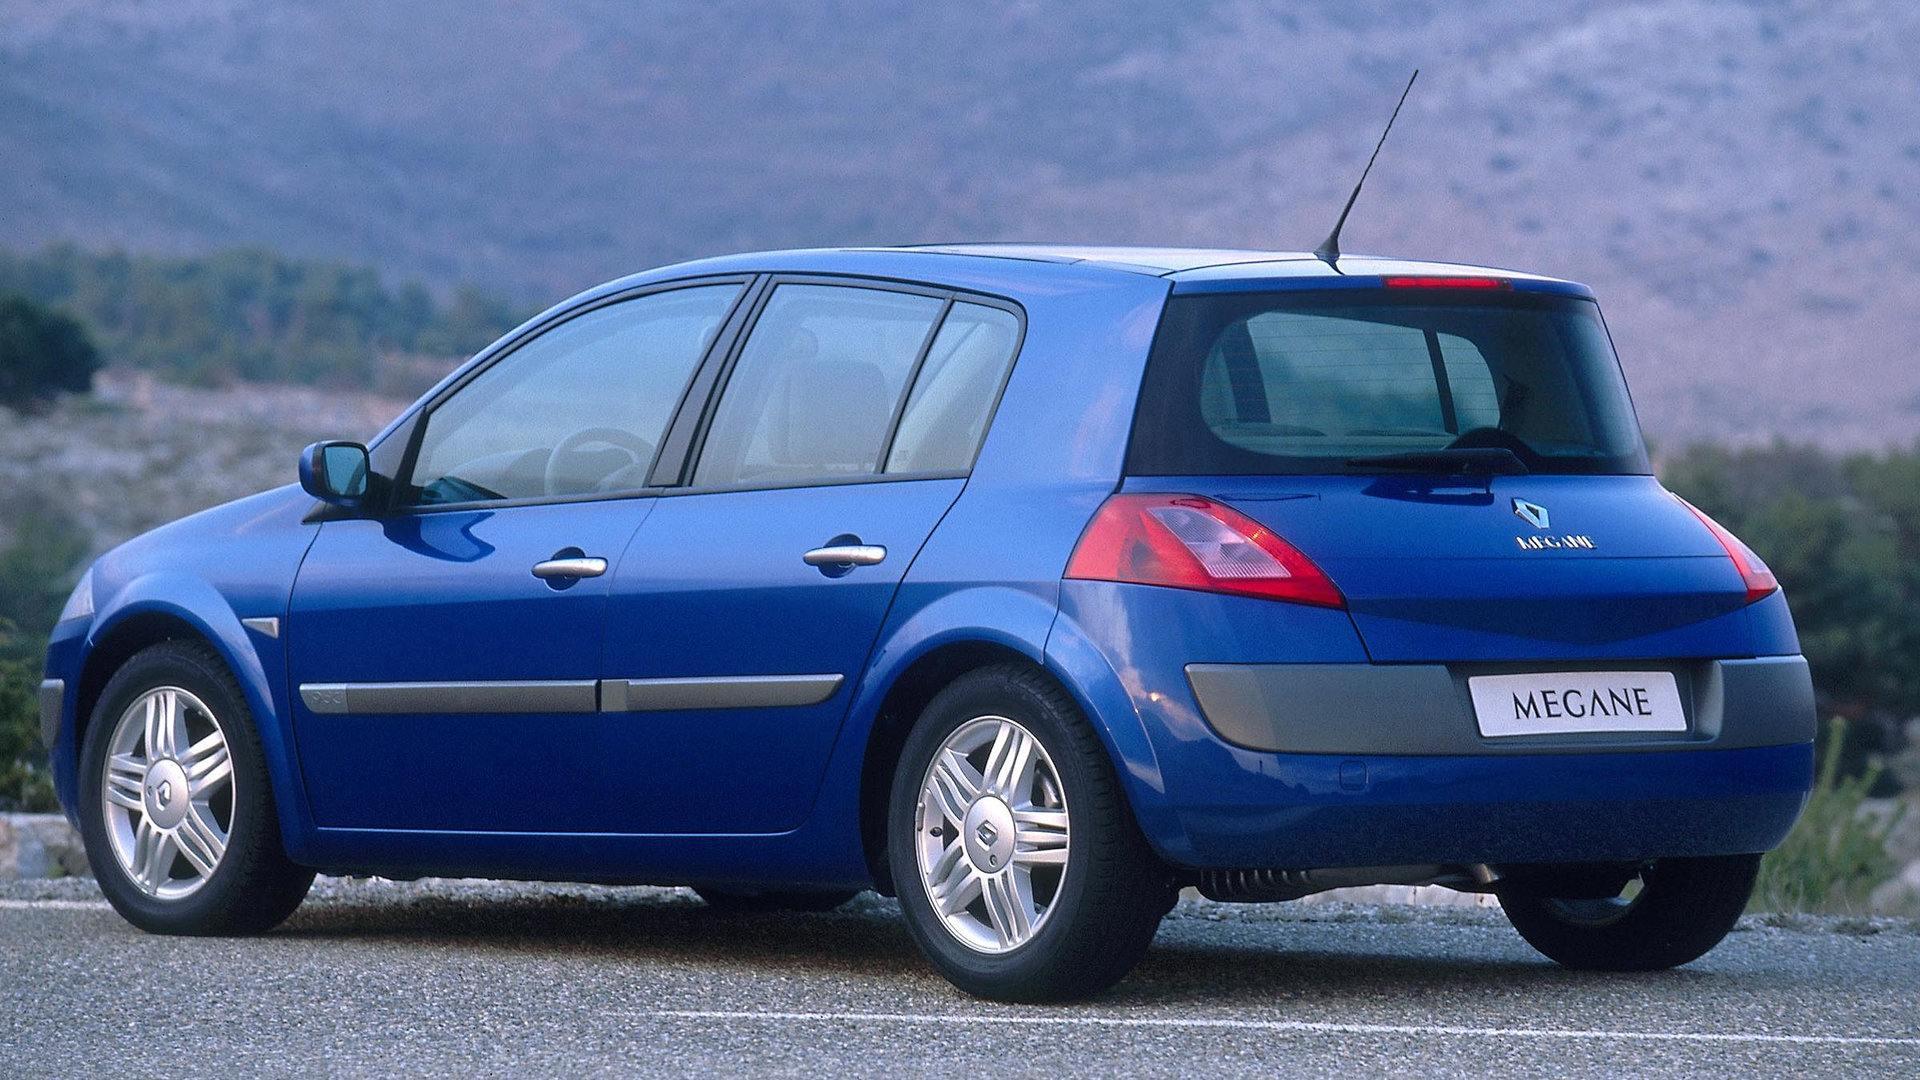 Renault Megane dCi 5p 3